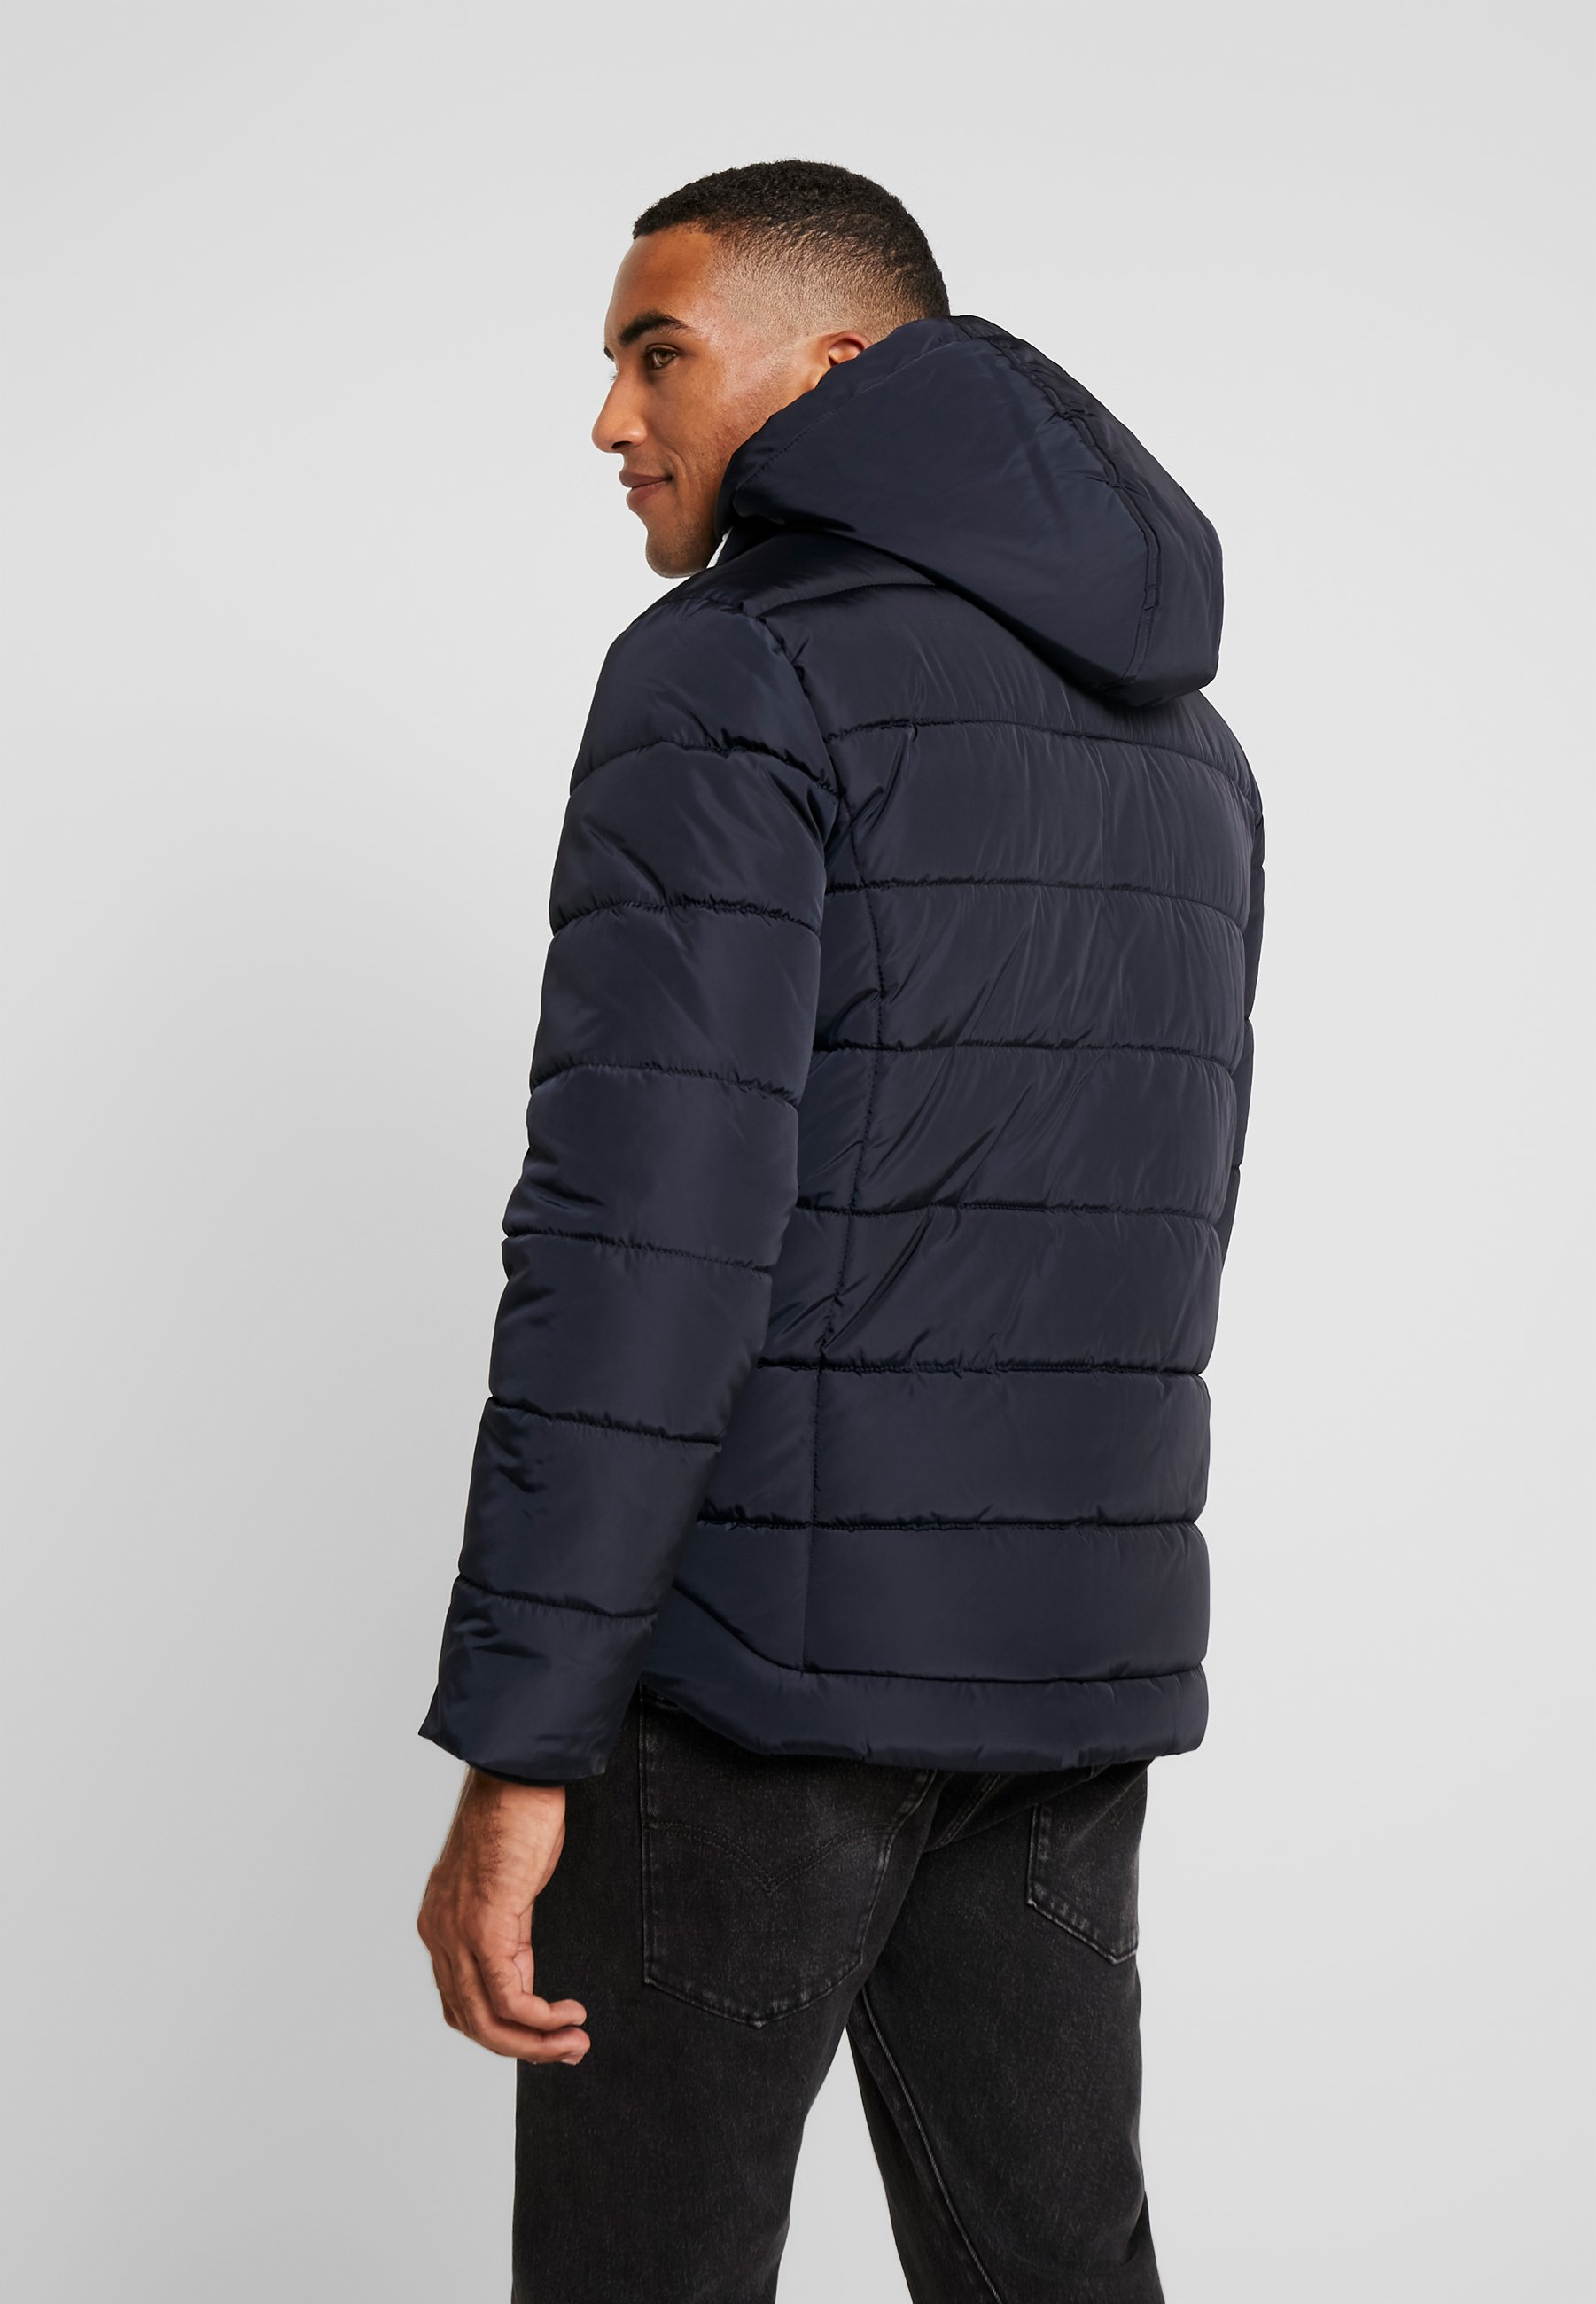 Inexpensive Wholesale Blend OUTERWEAR - Winter jacket - dark navy blue | men's clothing 2020 cU7dV